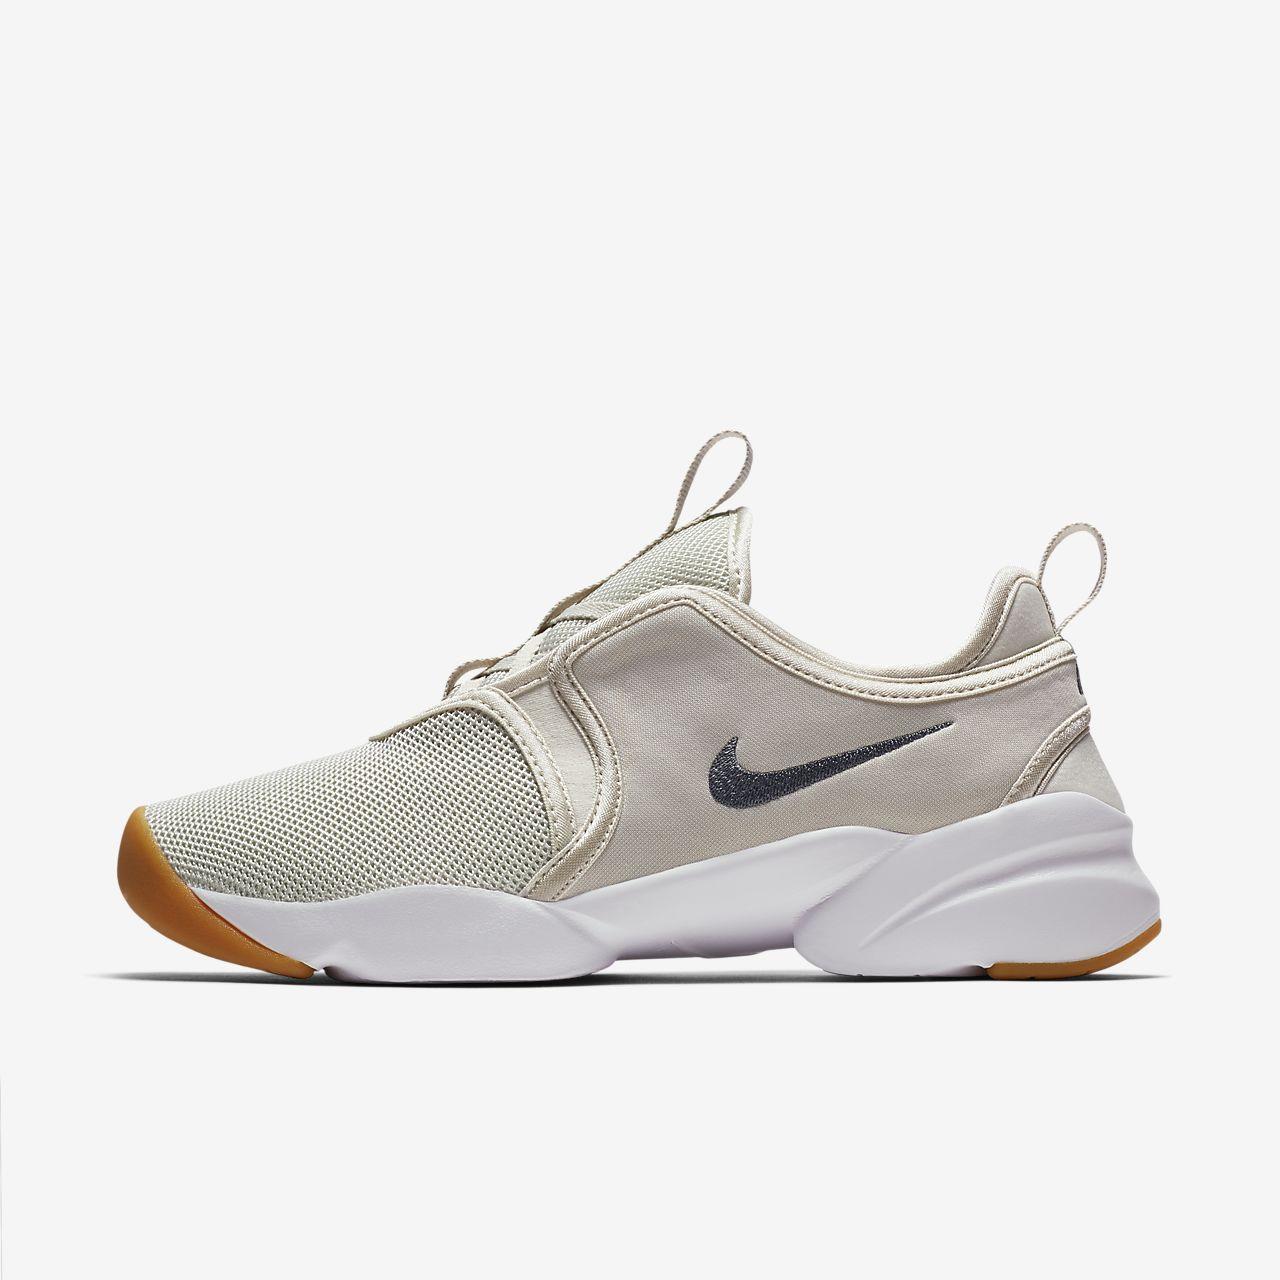 Low Resolution Nike Loden Women's Shoe Nike Loden Women's Shoe